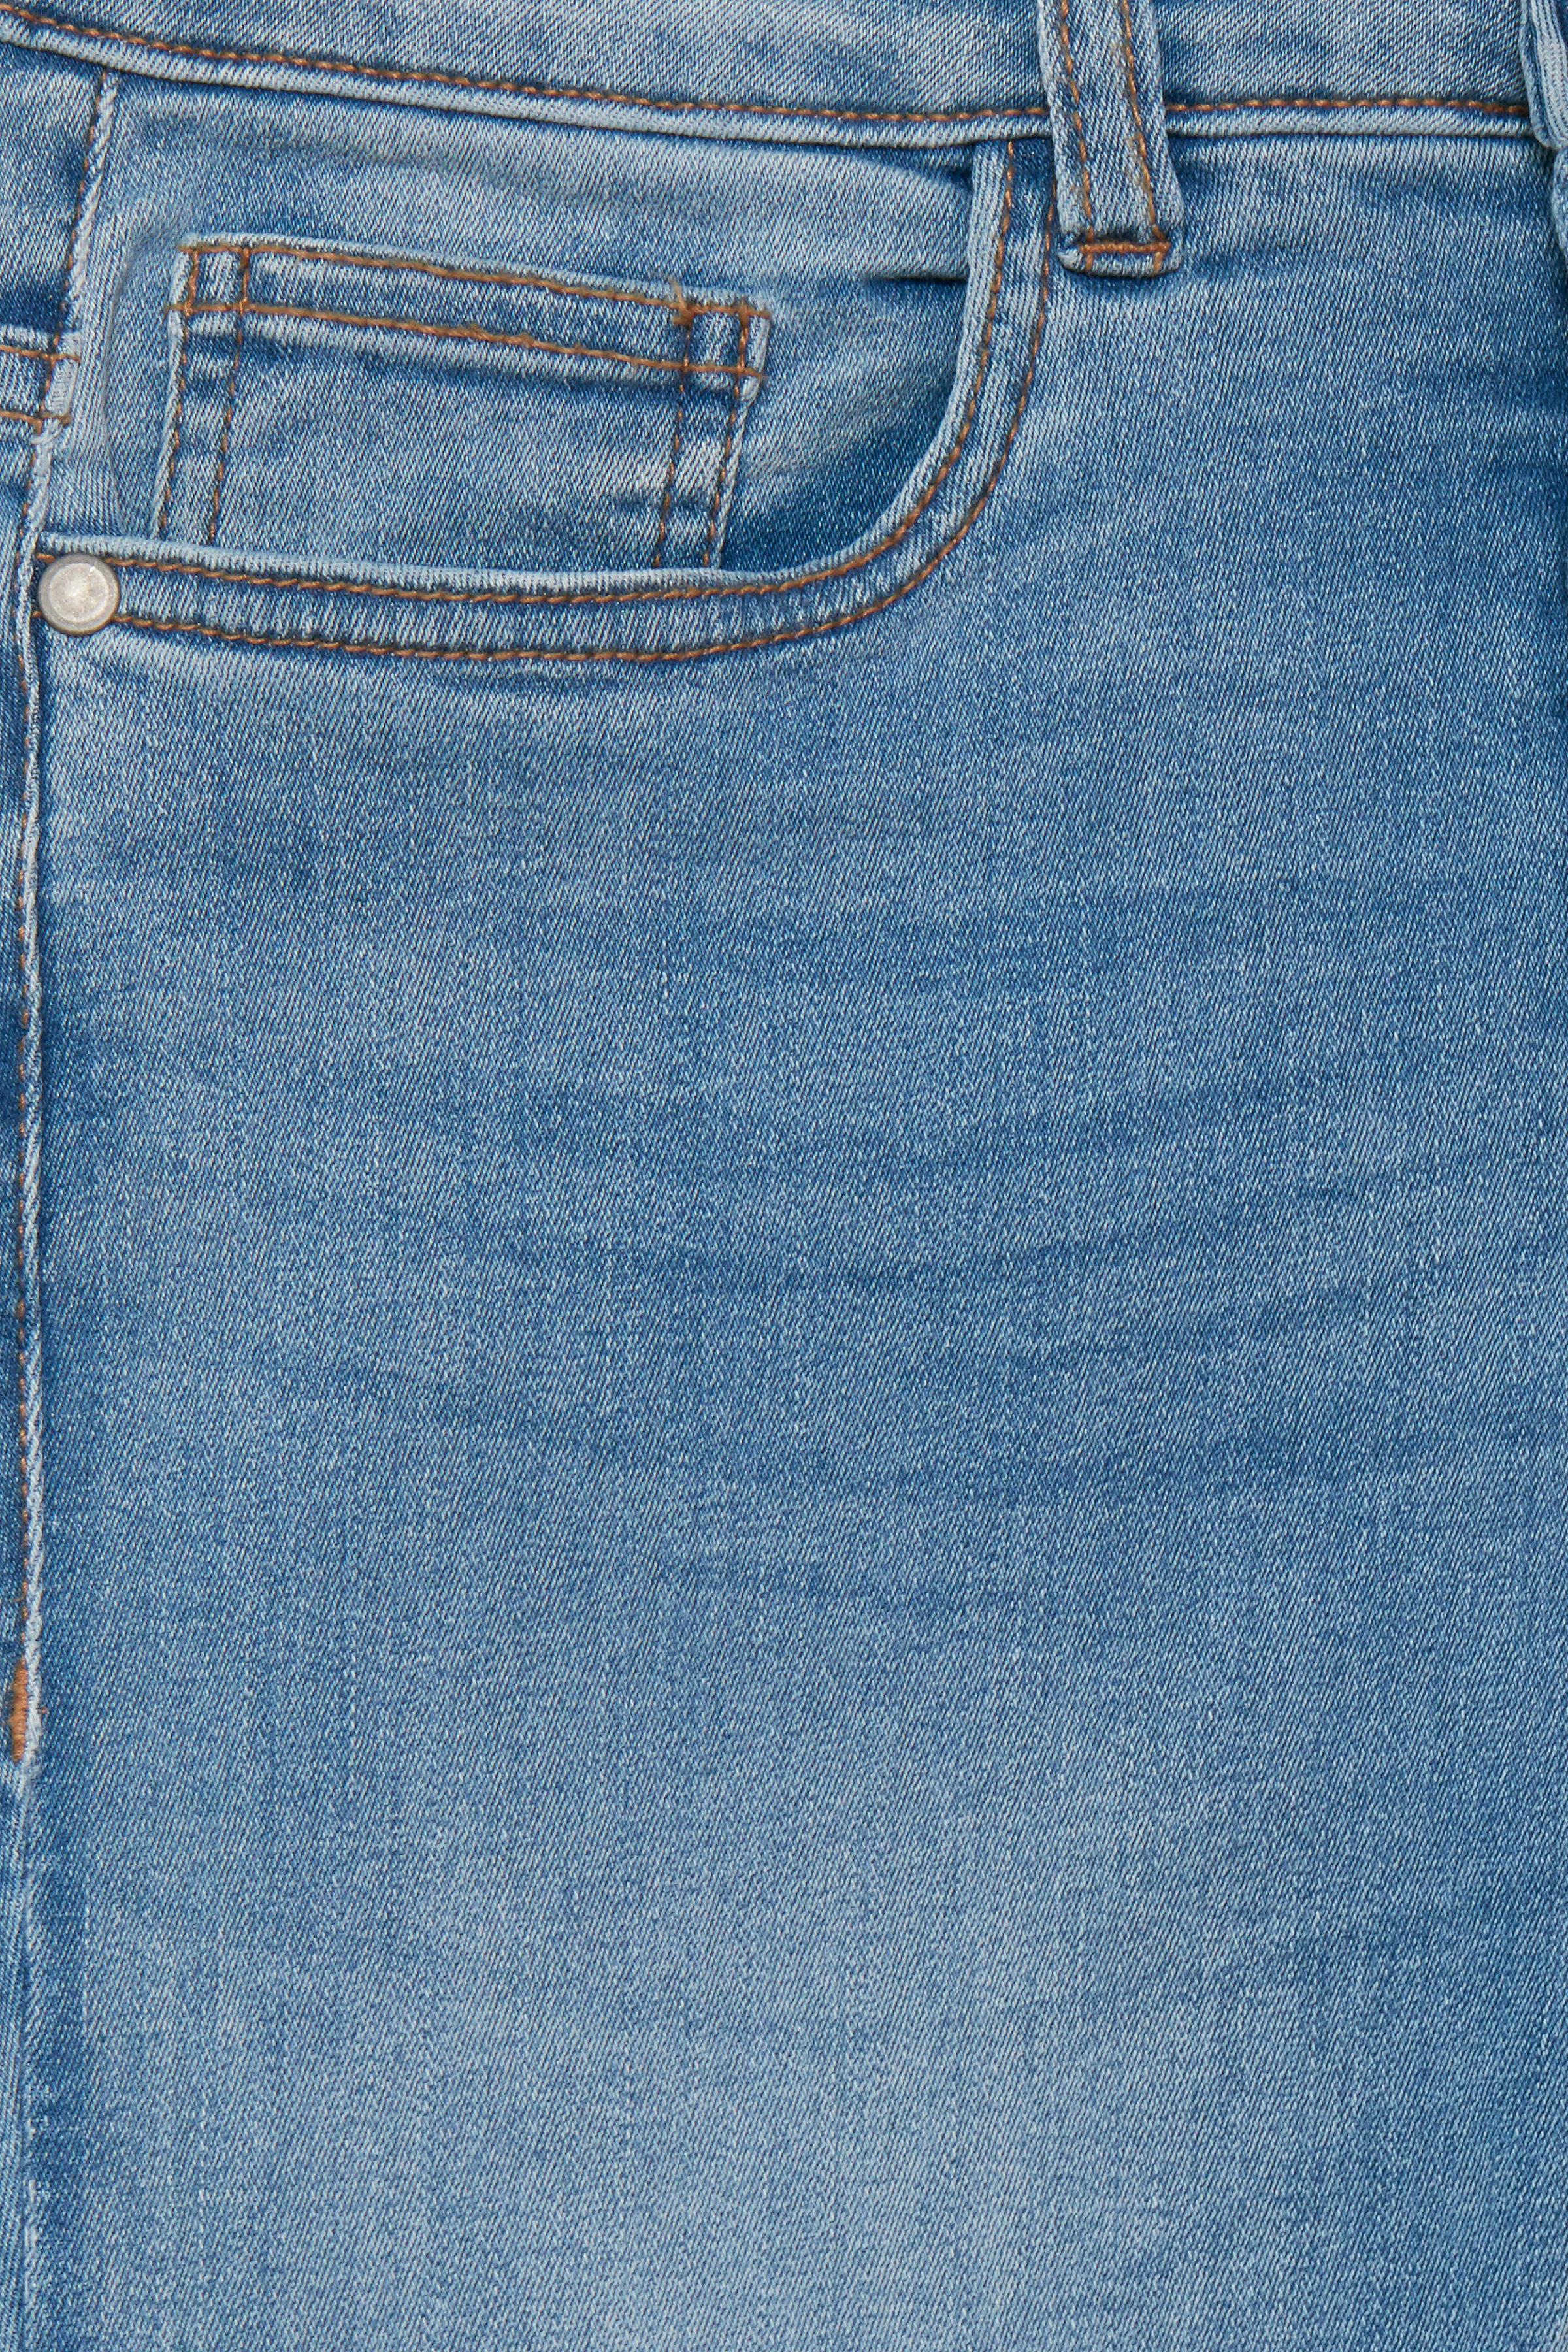 Lys denimblå Jeans fra Fransa – Køb Lys denimblå Jeans fra str. 34-46 her